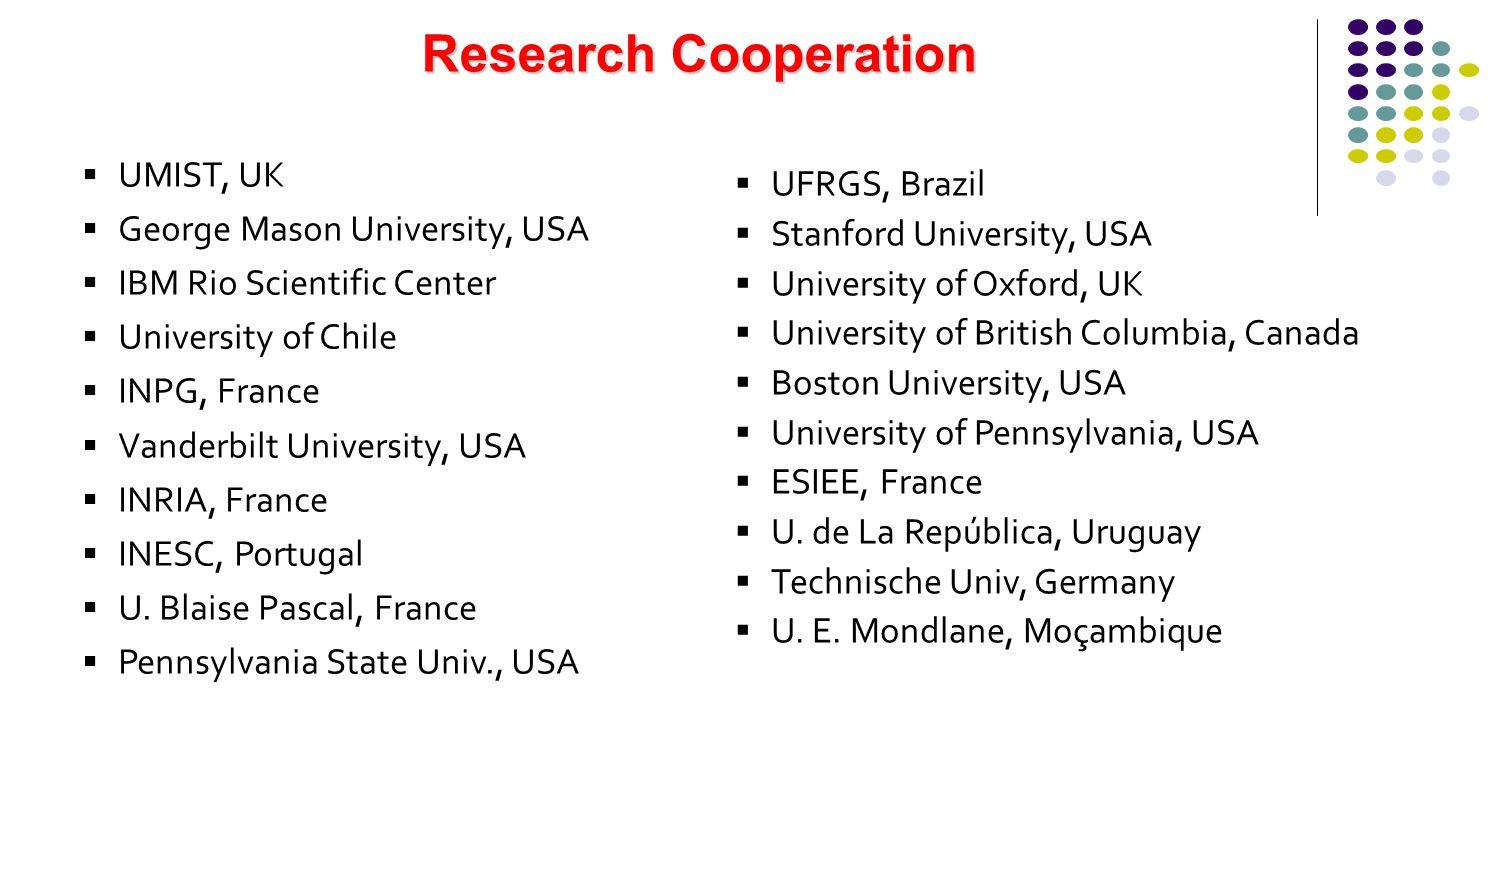 Research Cooperation UMIST, UK George Mason University, USA IBM Rio Scientific Center University of Chile INPG, France Vanderbilt University, USA INRI